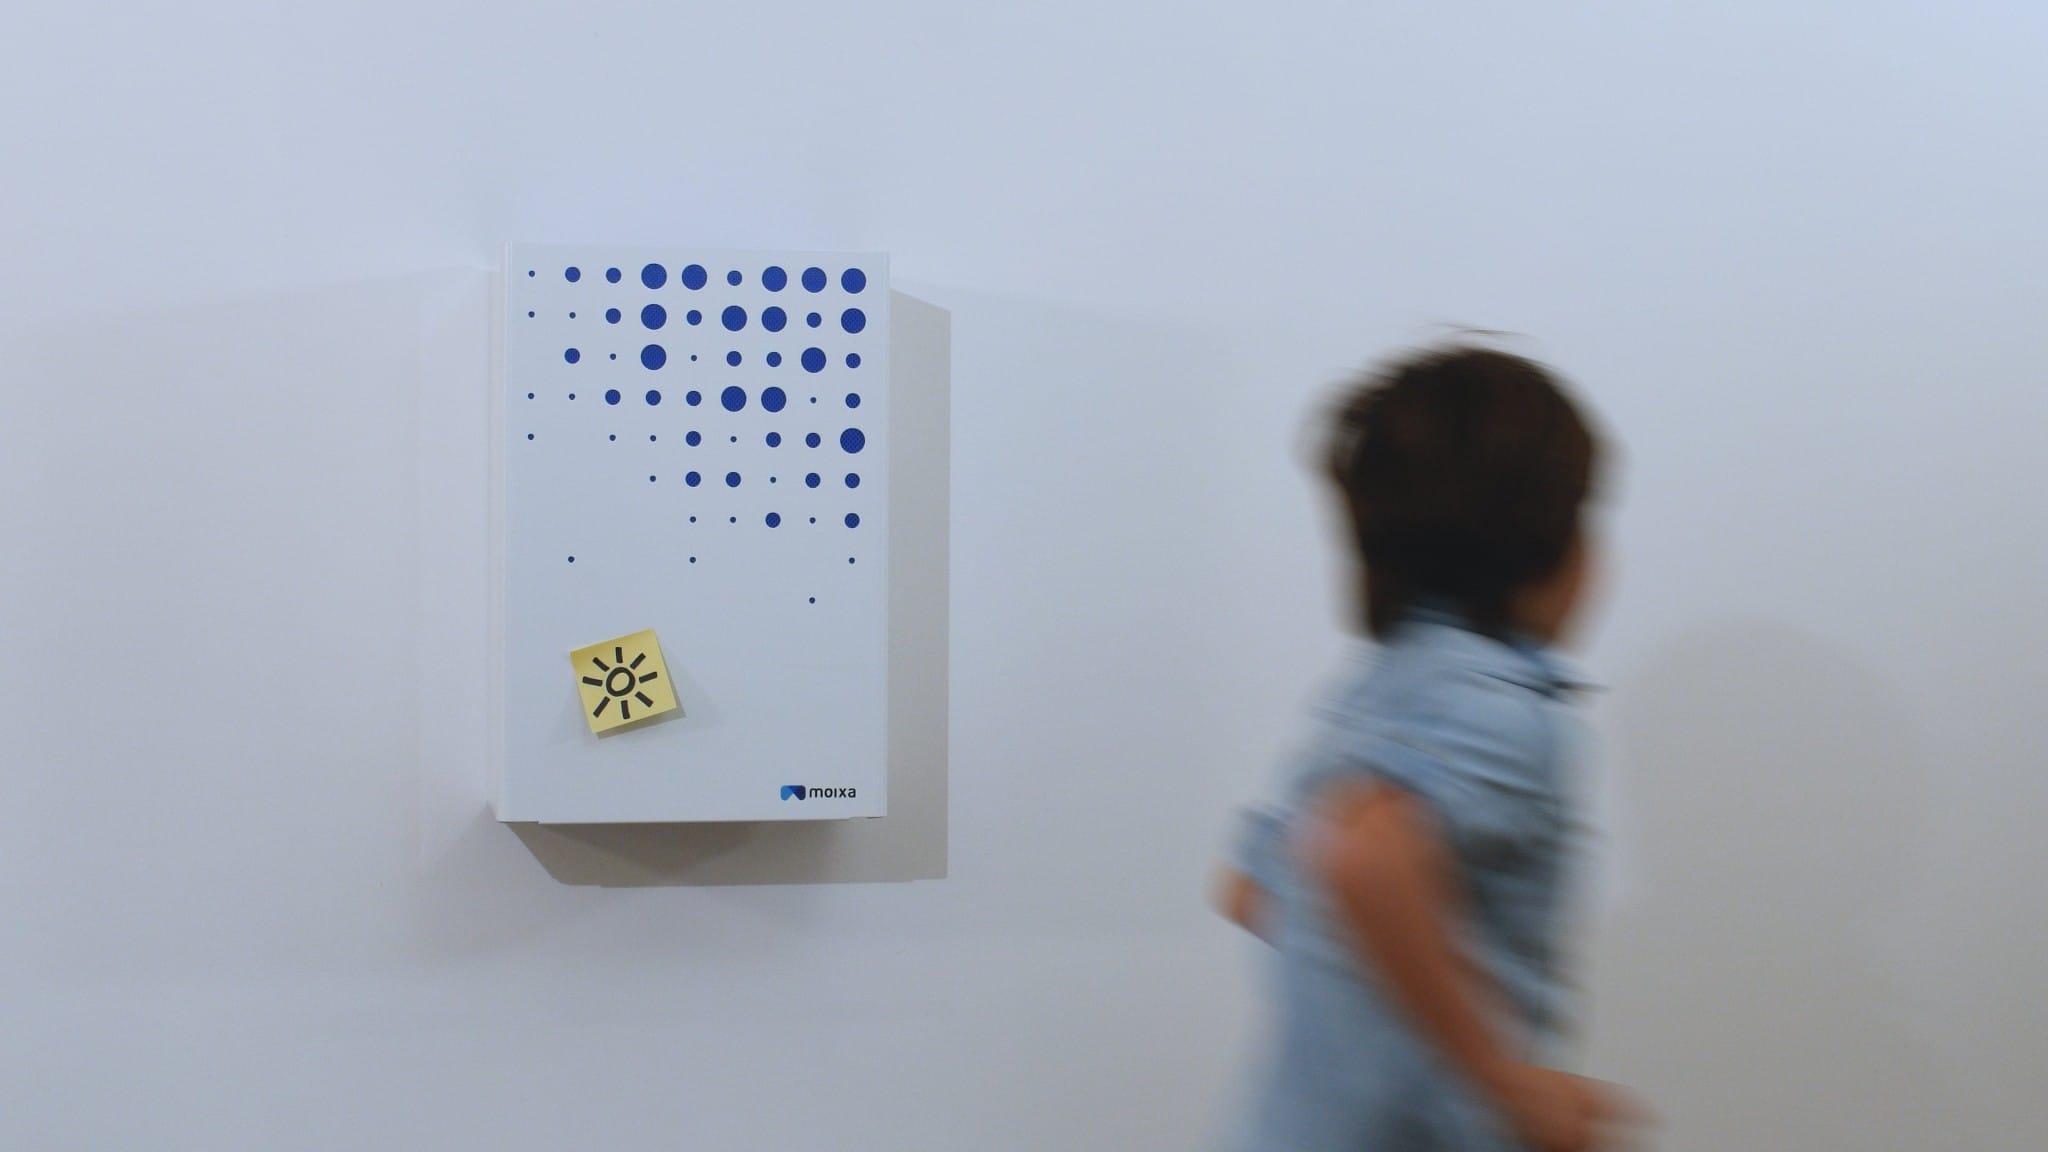 001 1 Moixa | Home Energy Storage | Smart Energy Management